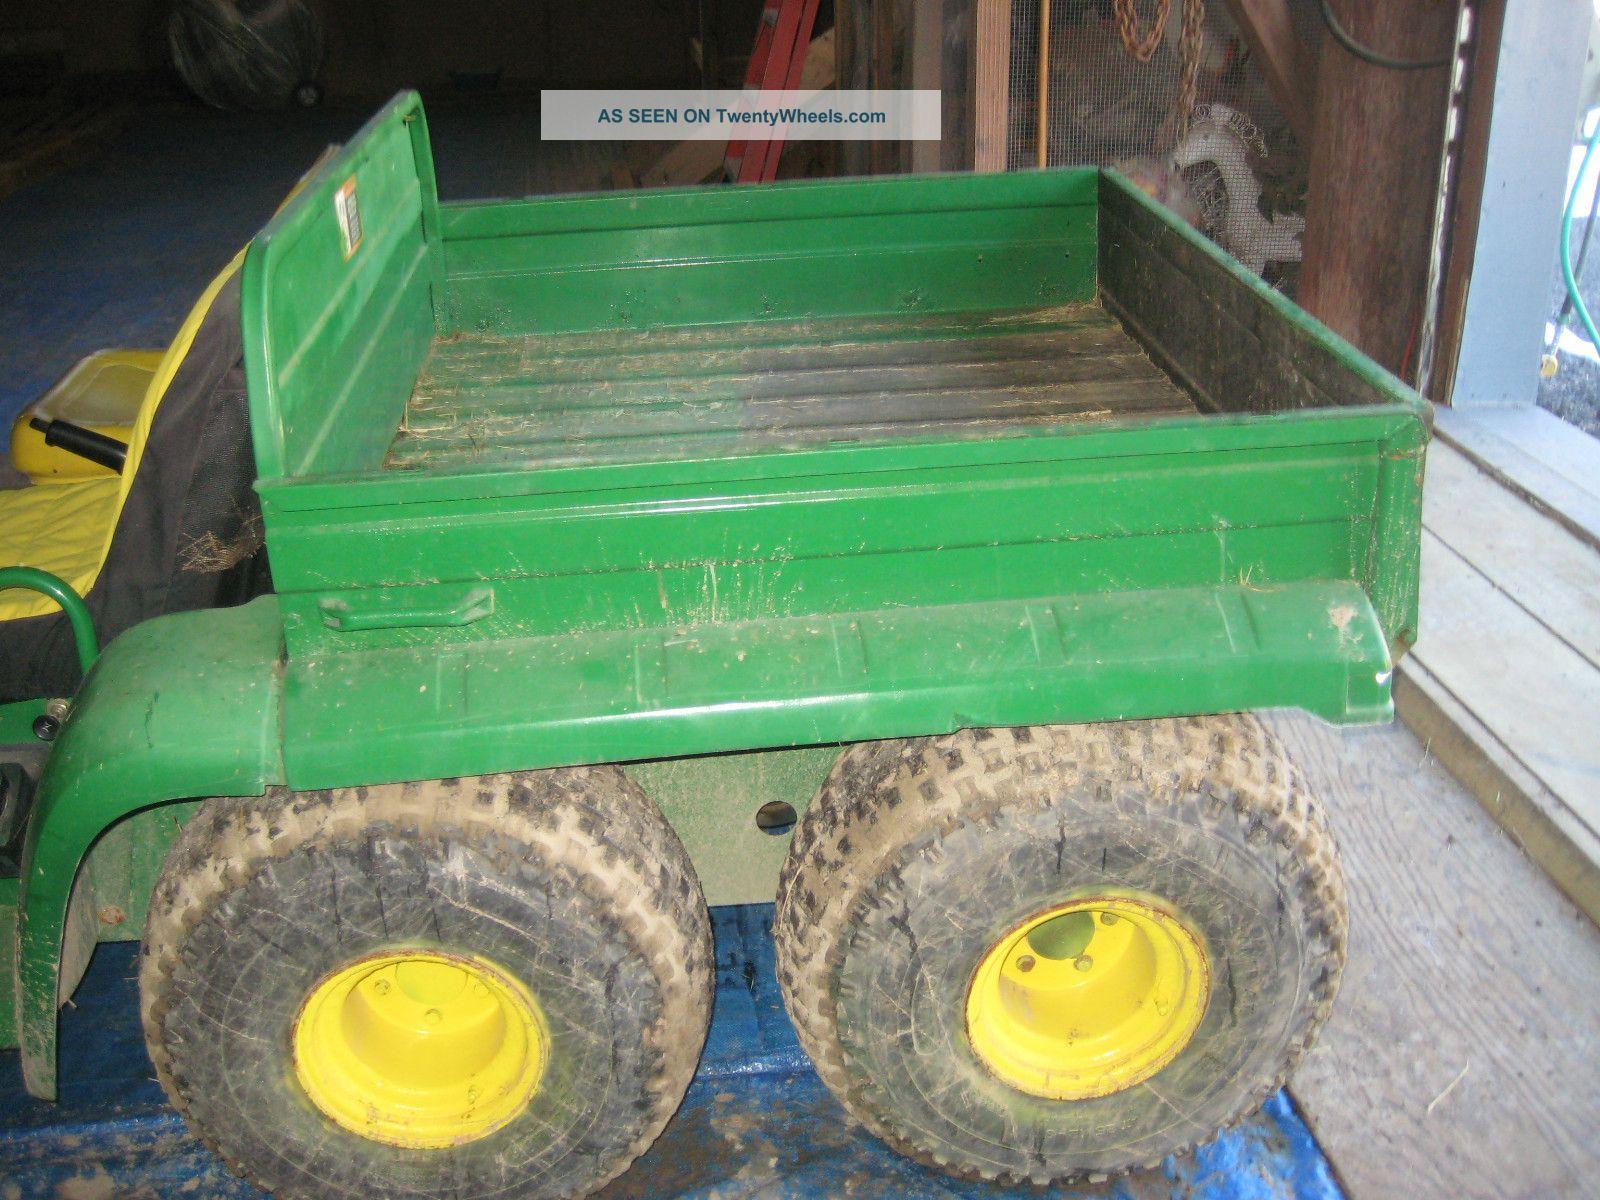 John Deere 2x6 Gator Farm Vehicle Utility Vehicles photo